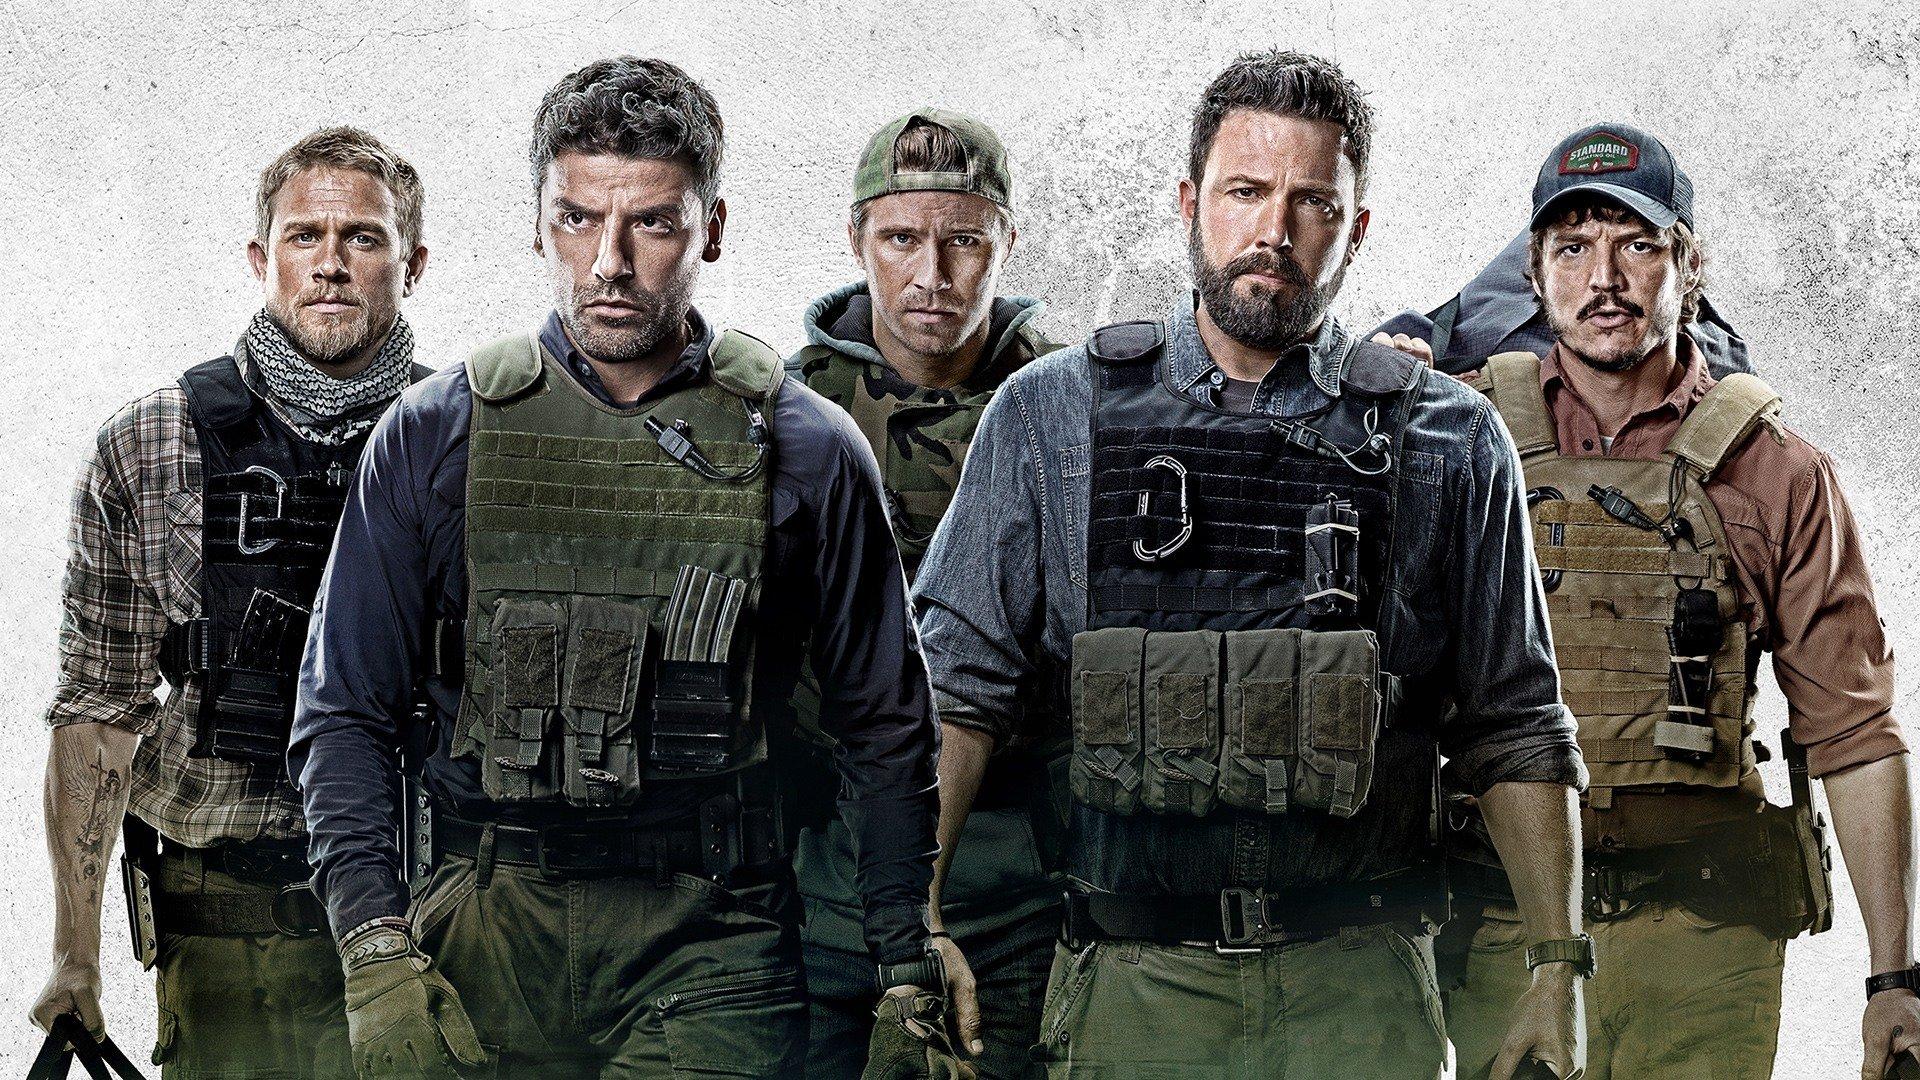 Triple Frontier : فیلمساز بااستعداد، چاندور، بار دیگر با فیلمی هیجانانگیز برگشته است